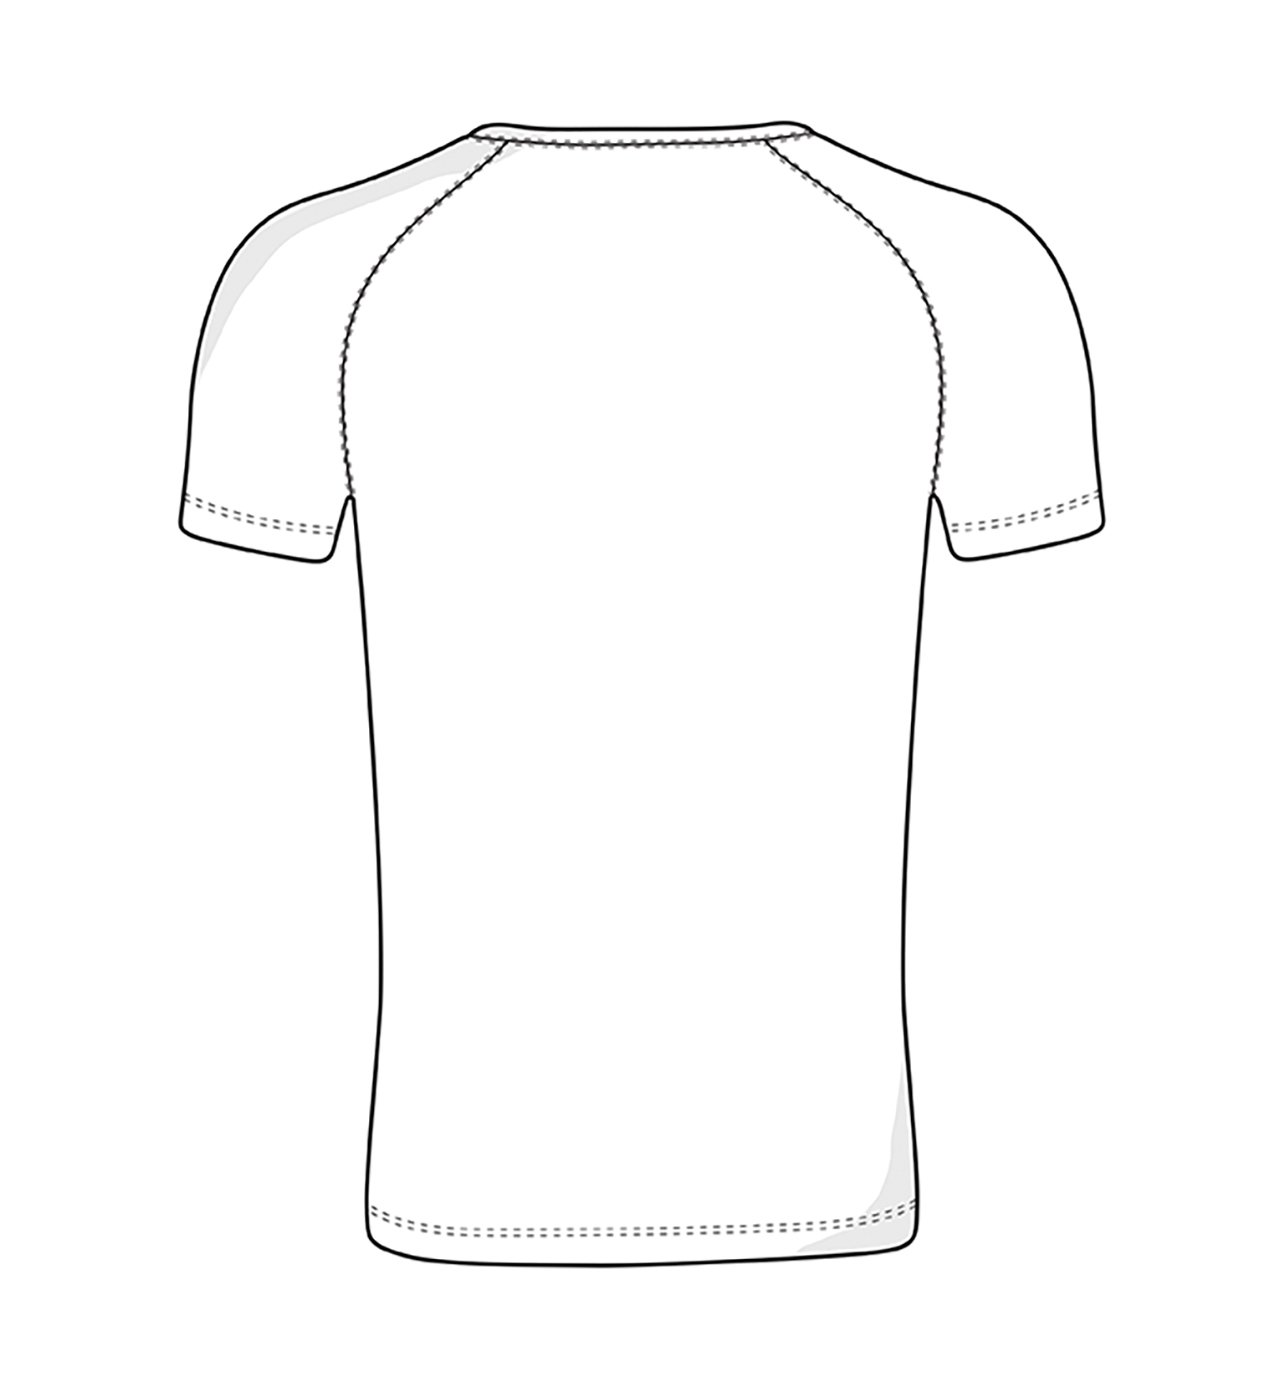 88c0fec3a6bdb5 ... Vorschau  GAME Active Herren T-Shirt